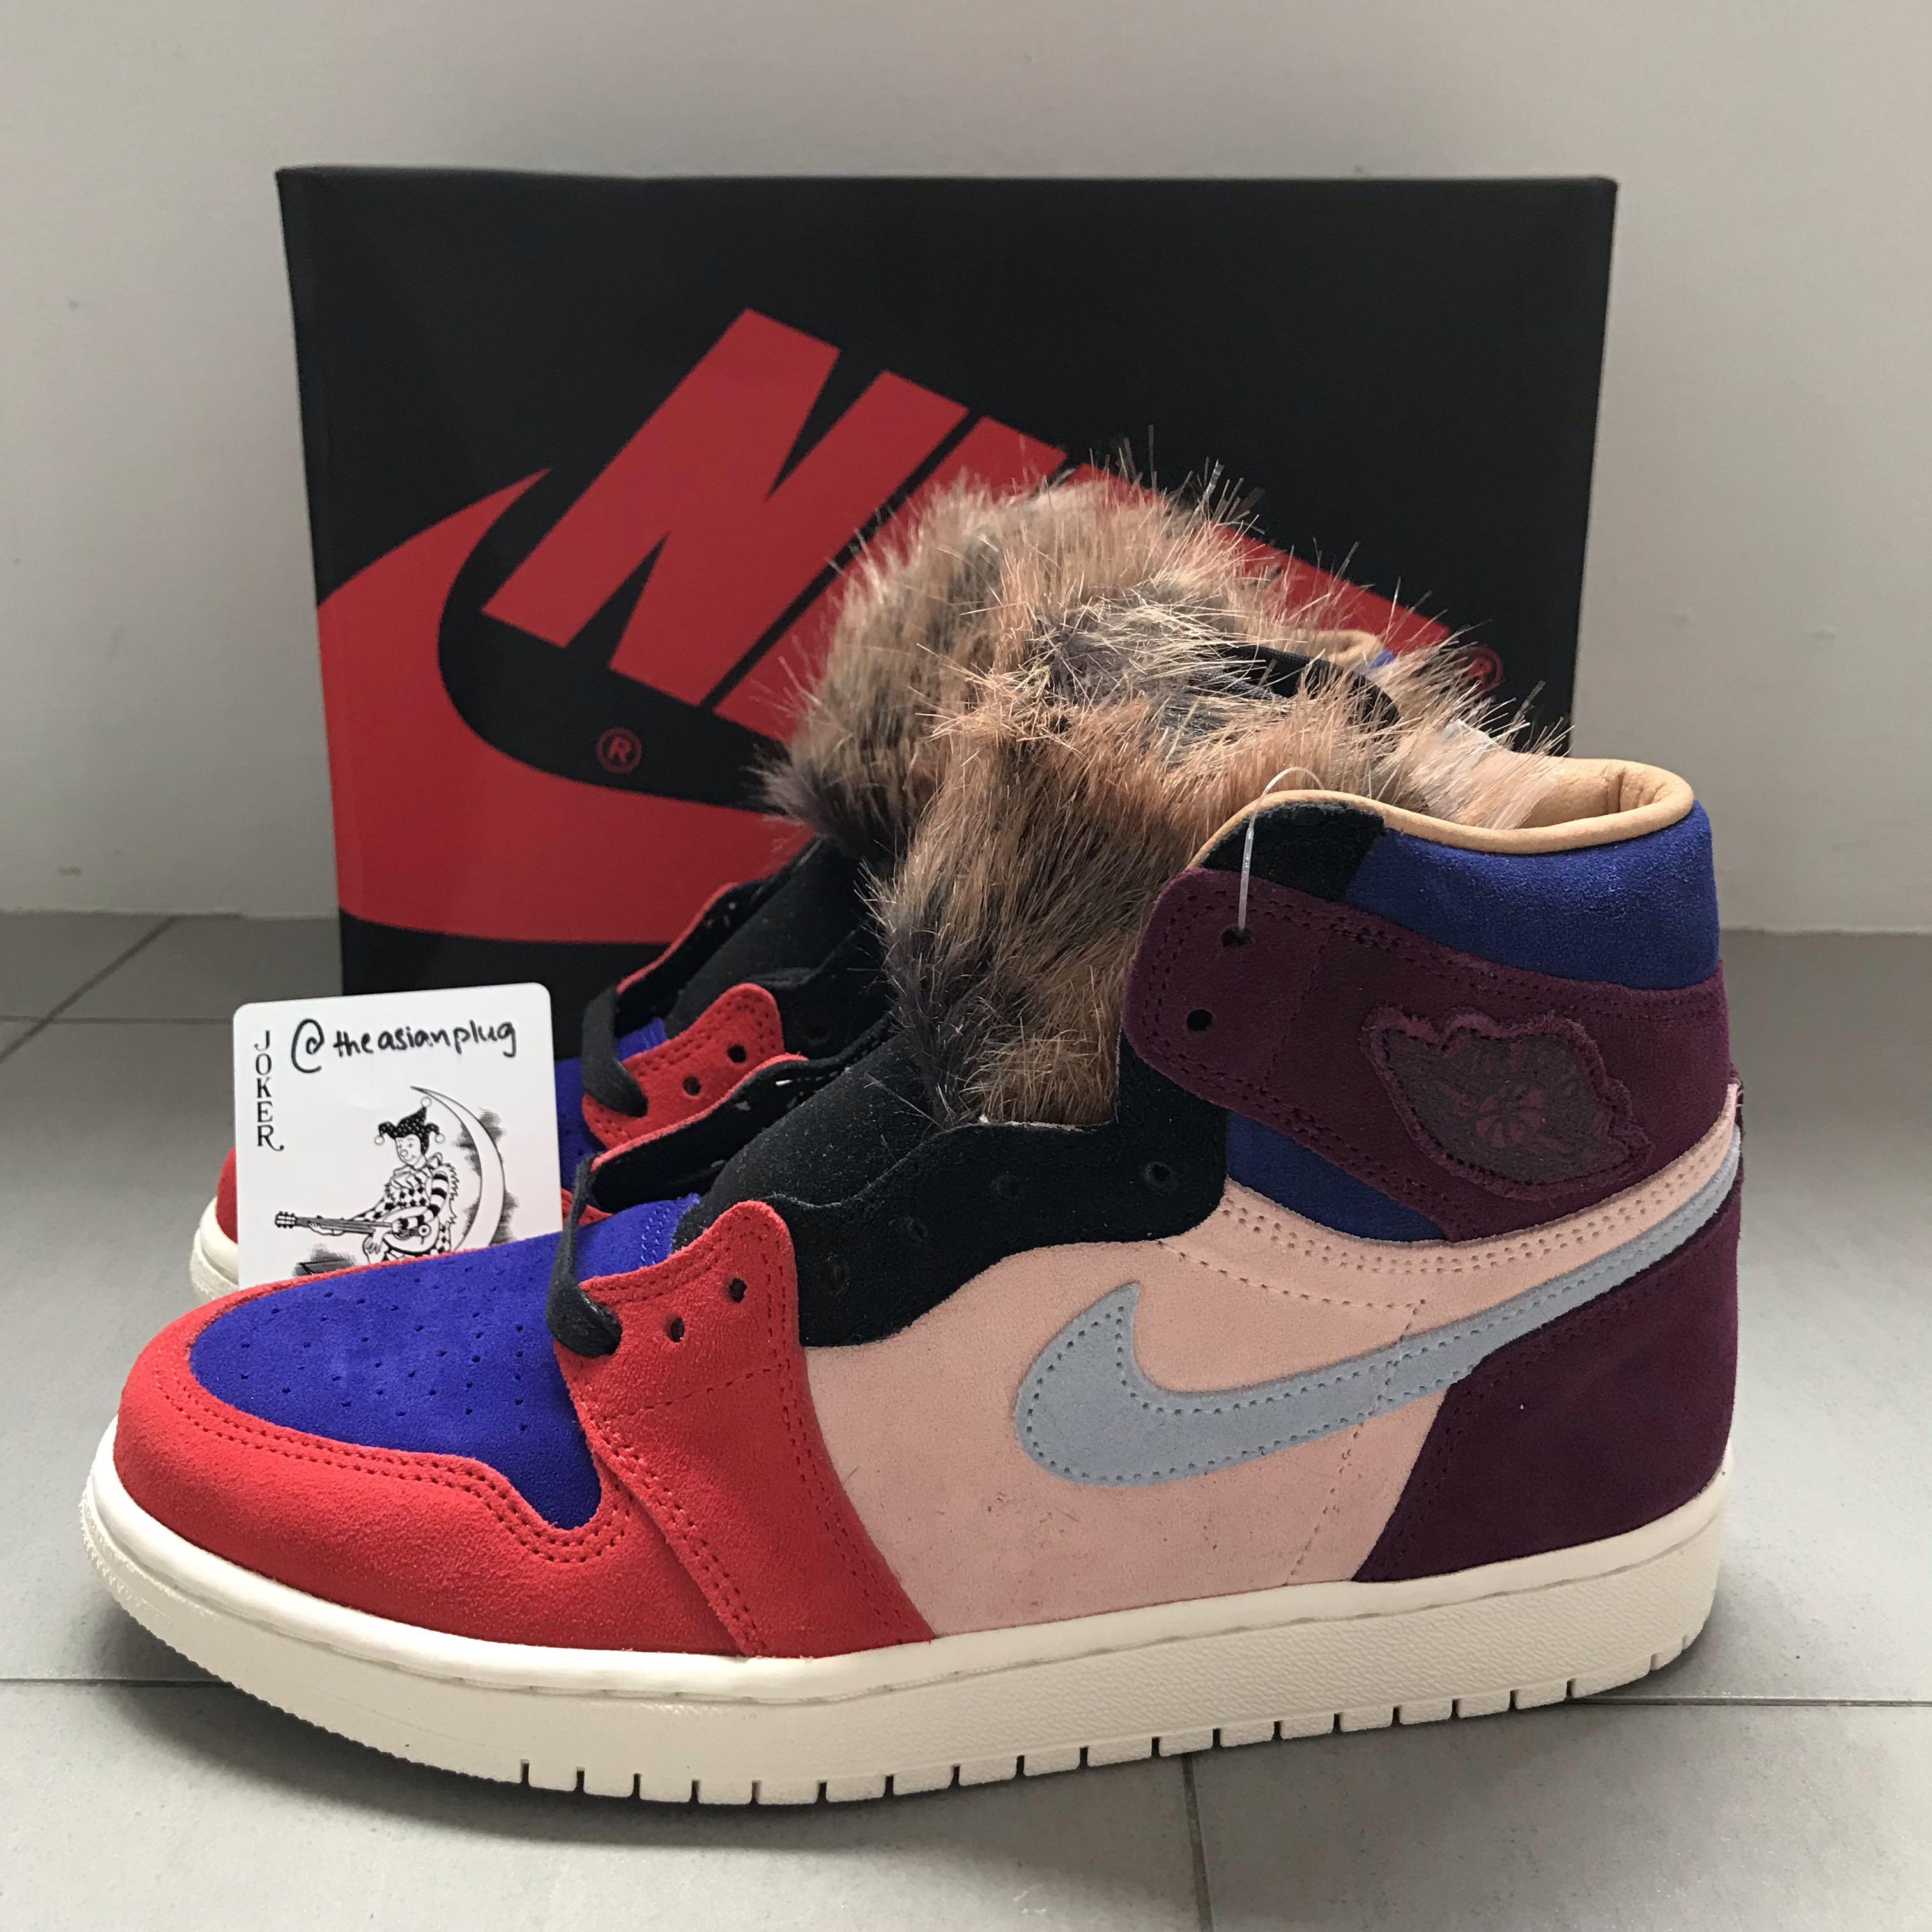 c7d4642c76783d Nike Jordan 1 Retro High Aleali May Court Luxe (W)